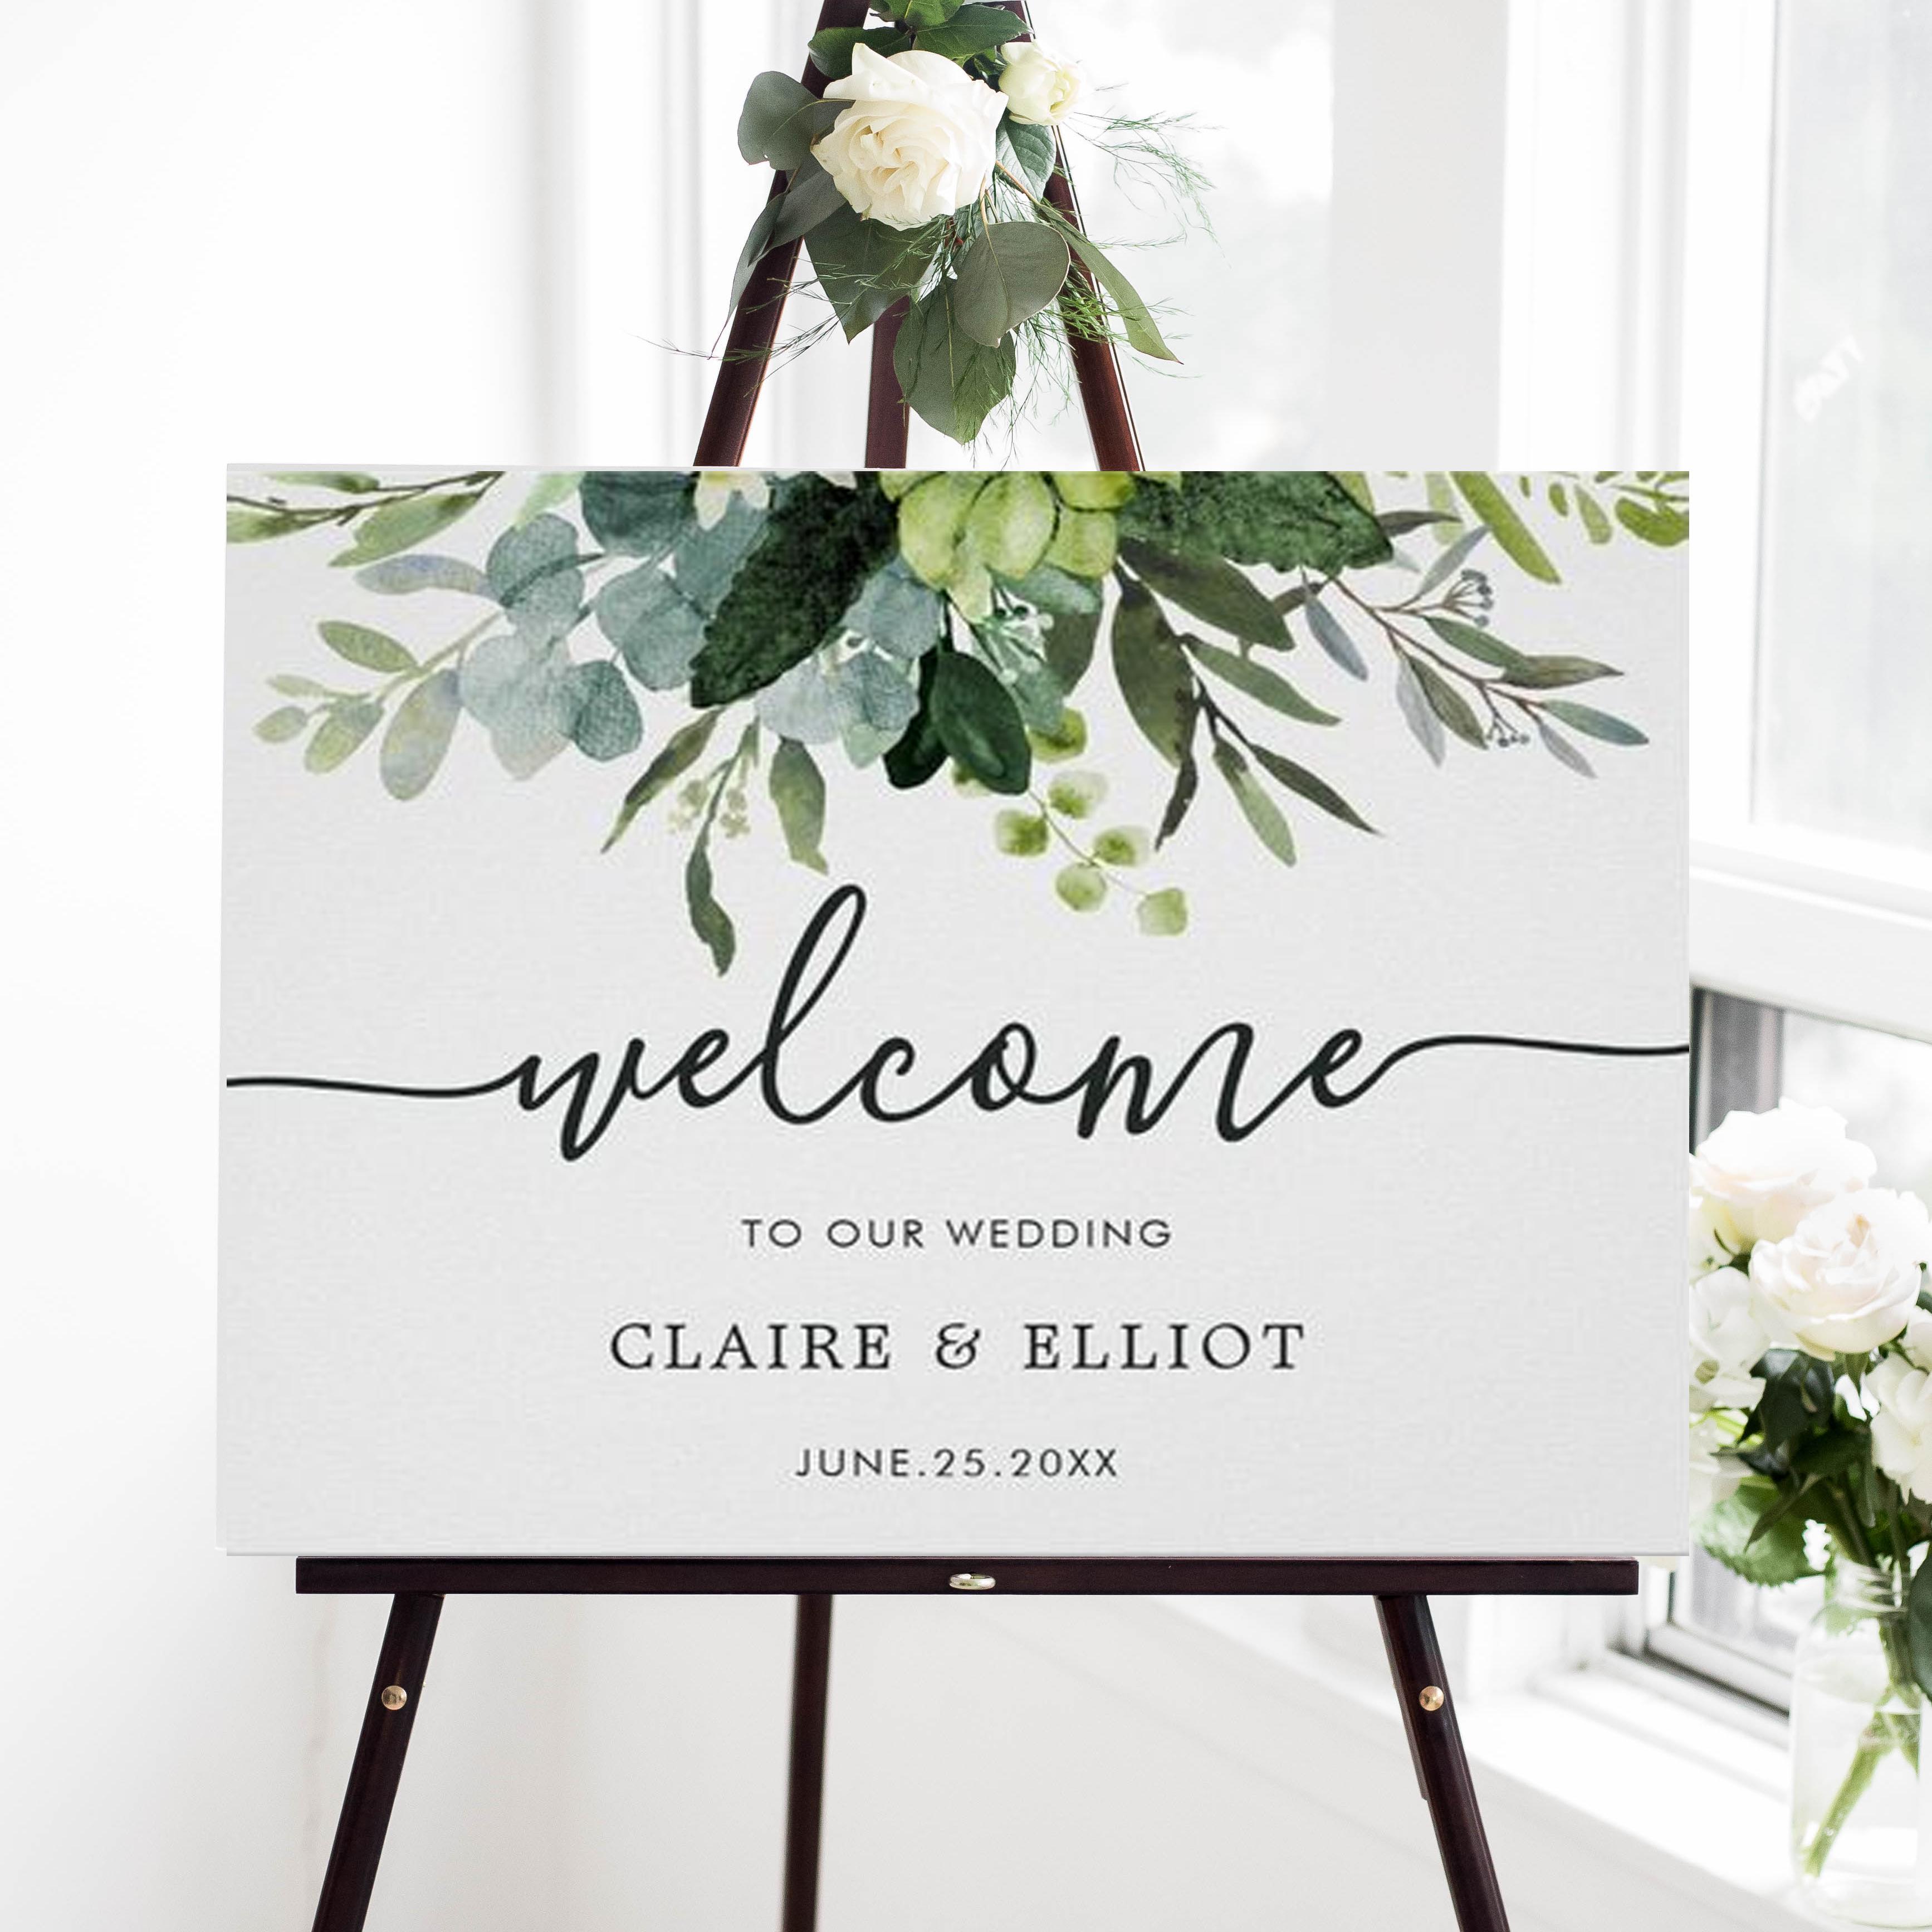 Eucalyptus Green Foliage Wedding Welcome Sign | Zazzle.com